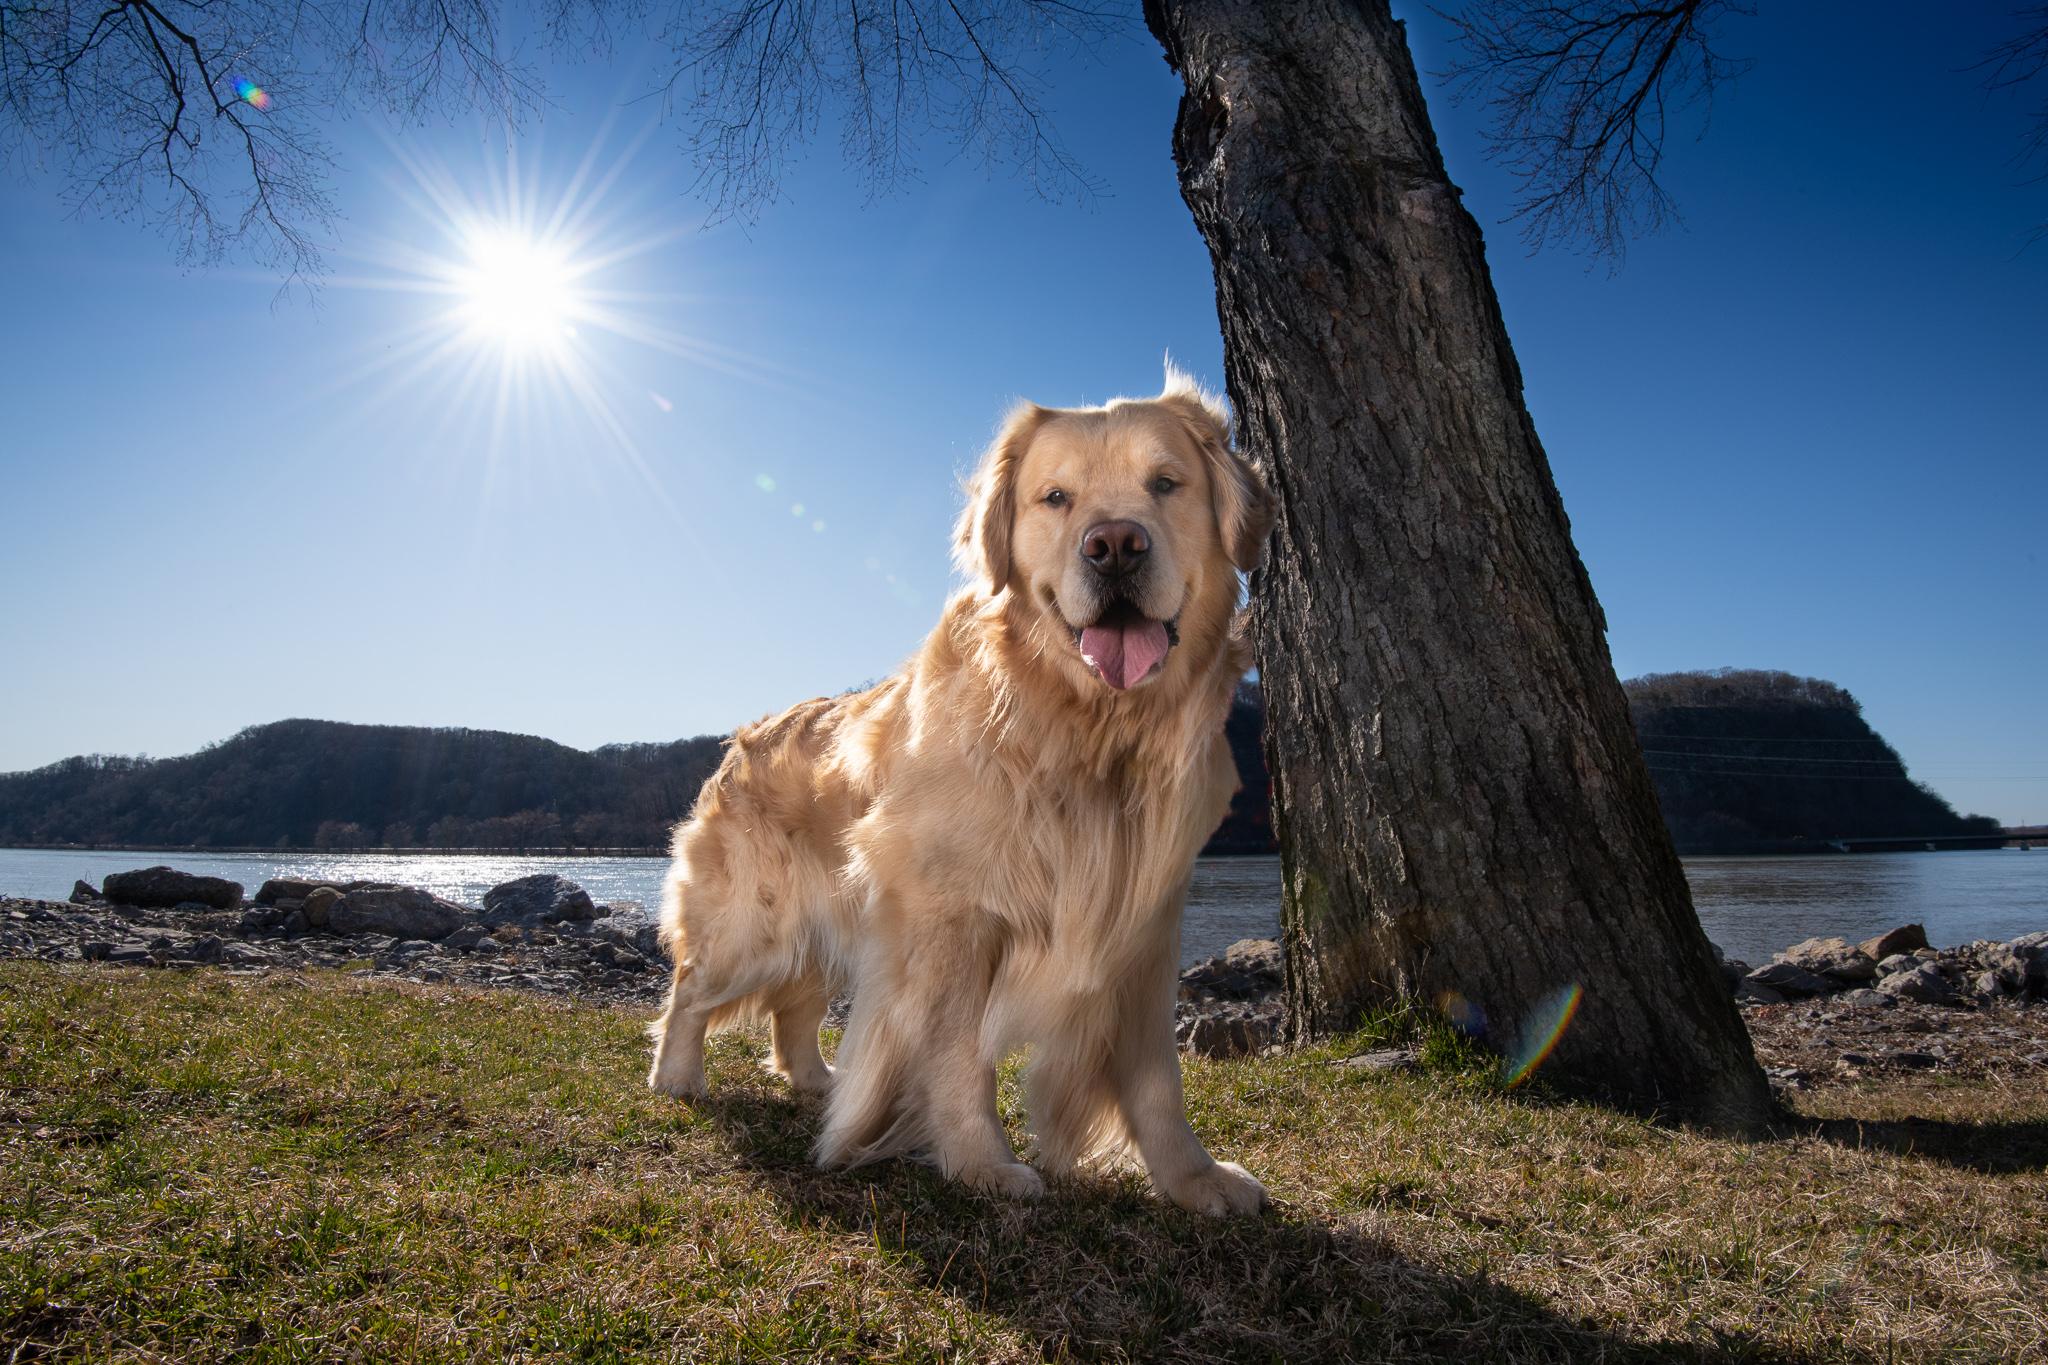 Dood Dog Photography - Rooney